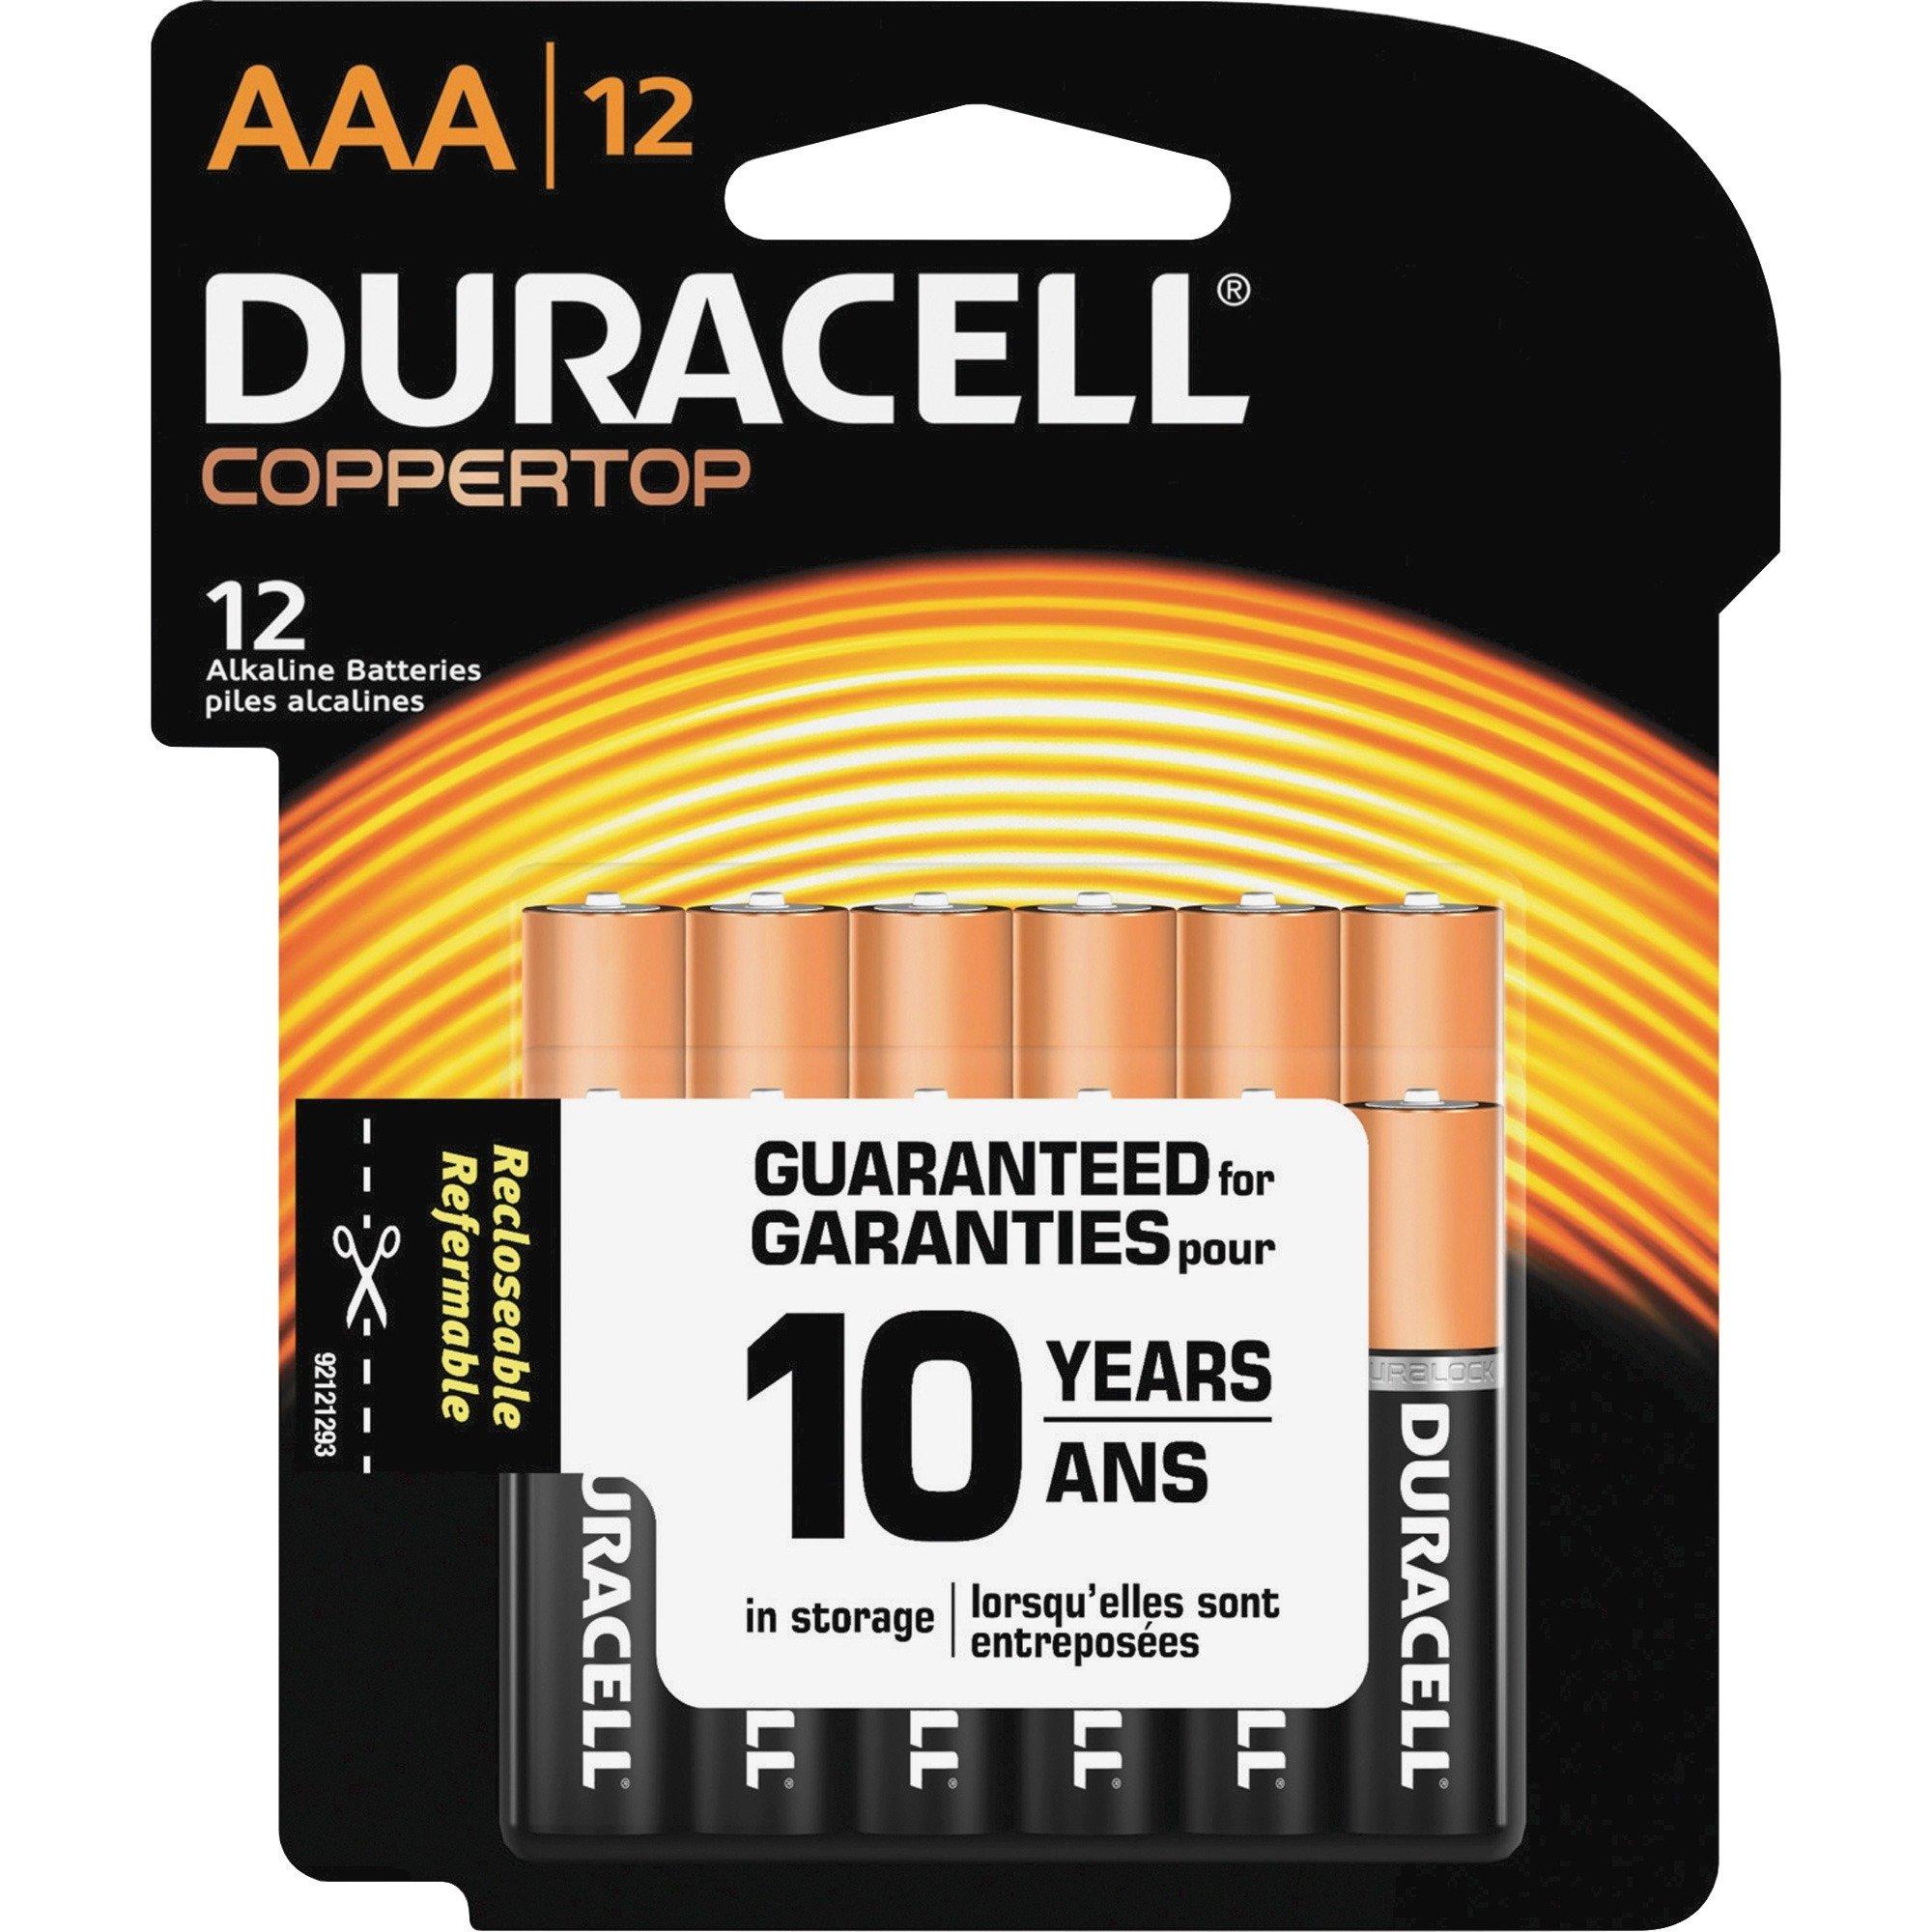 Duracell Coppertop Alkaline AAA Battery - MN2400 - 12/Pack